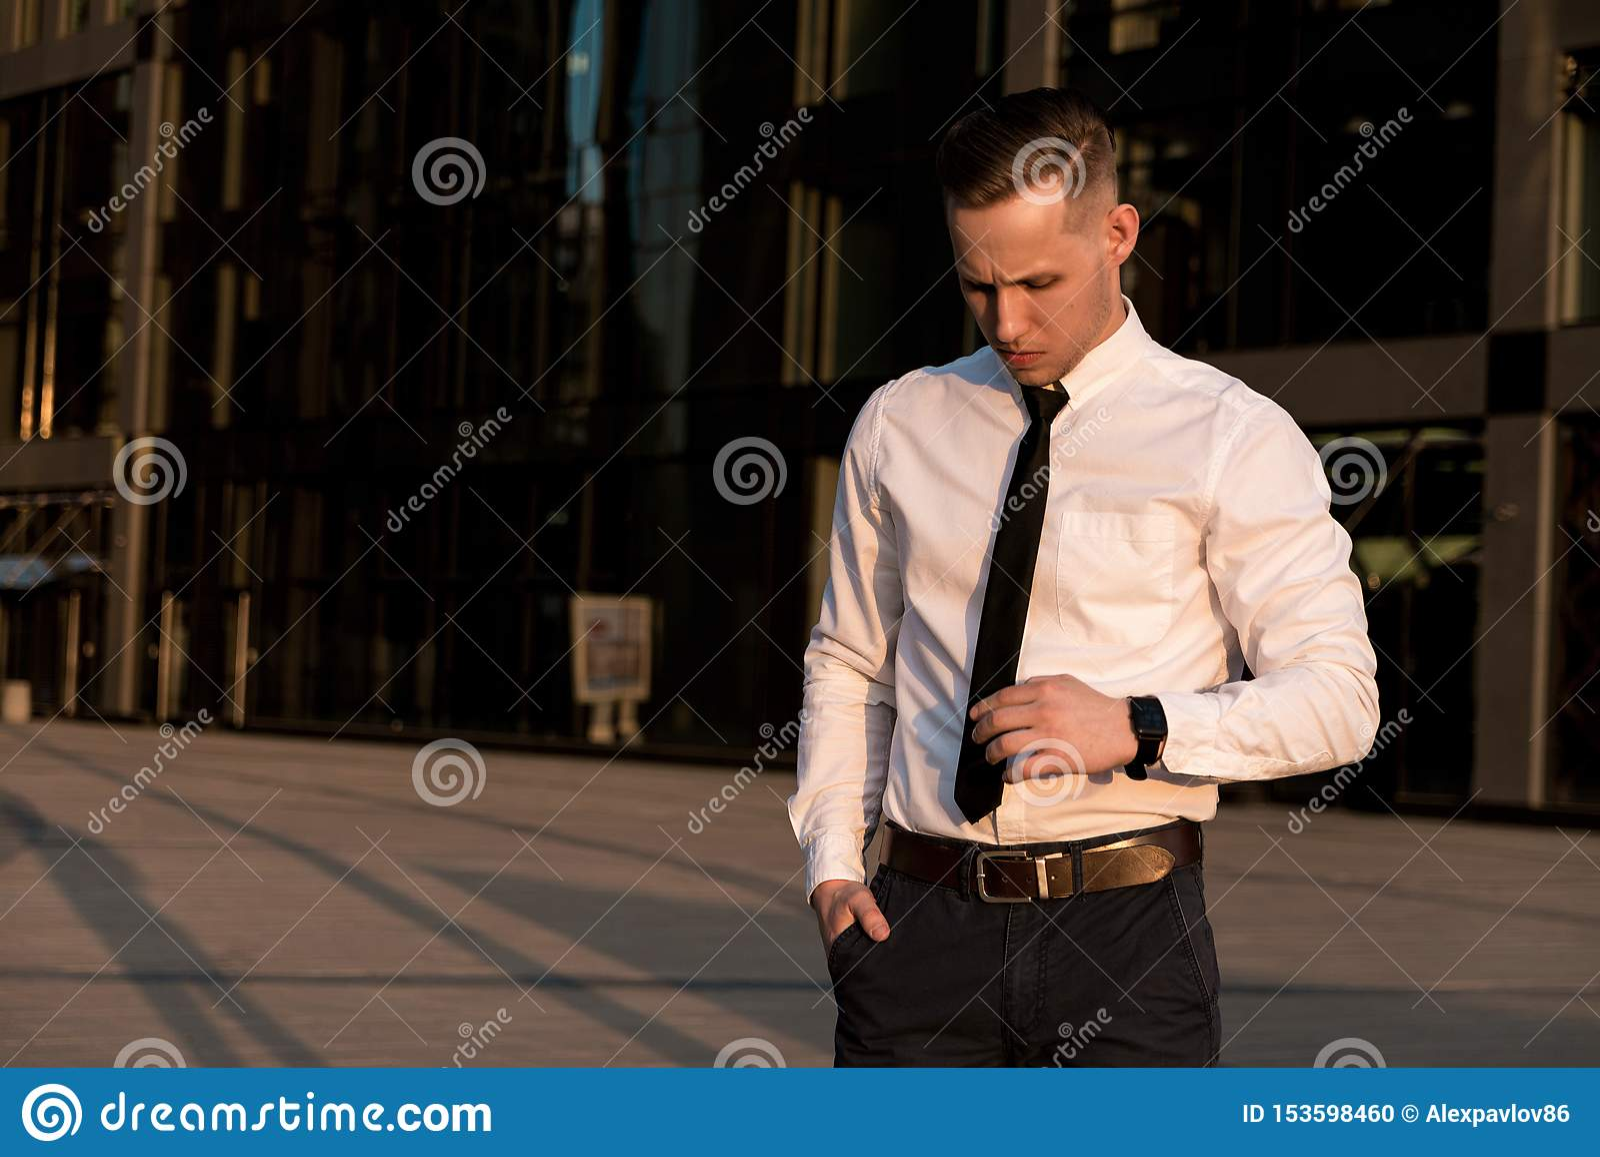 Молодой бизнесмен исправляет связь